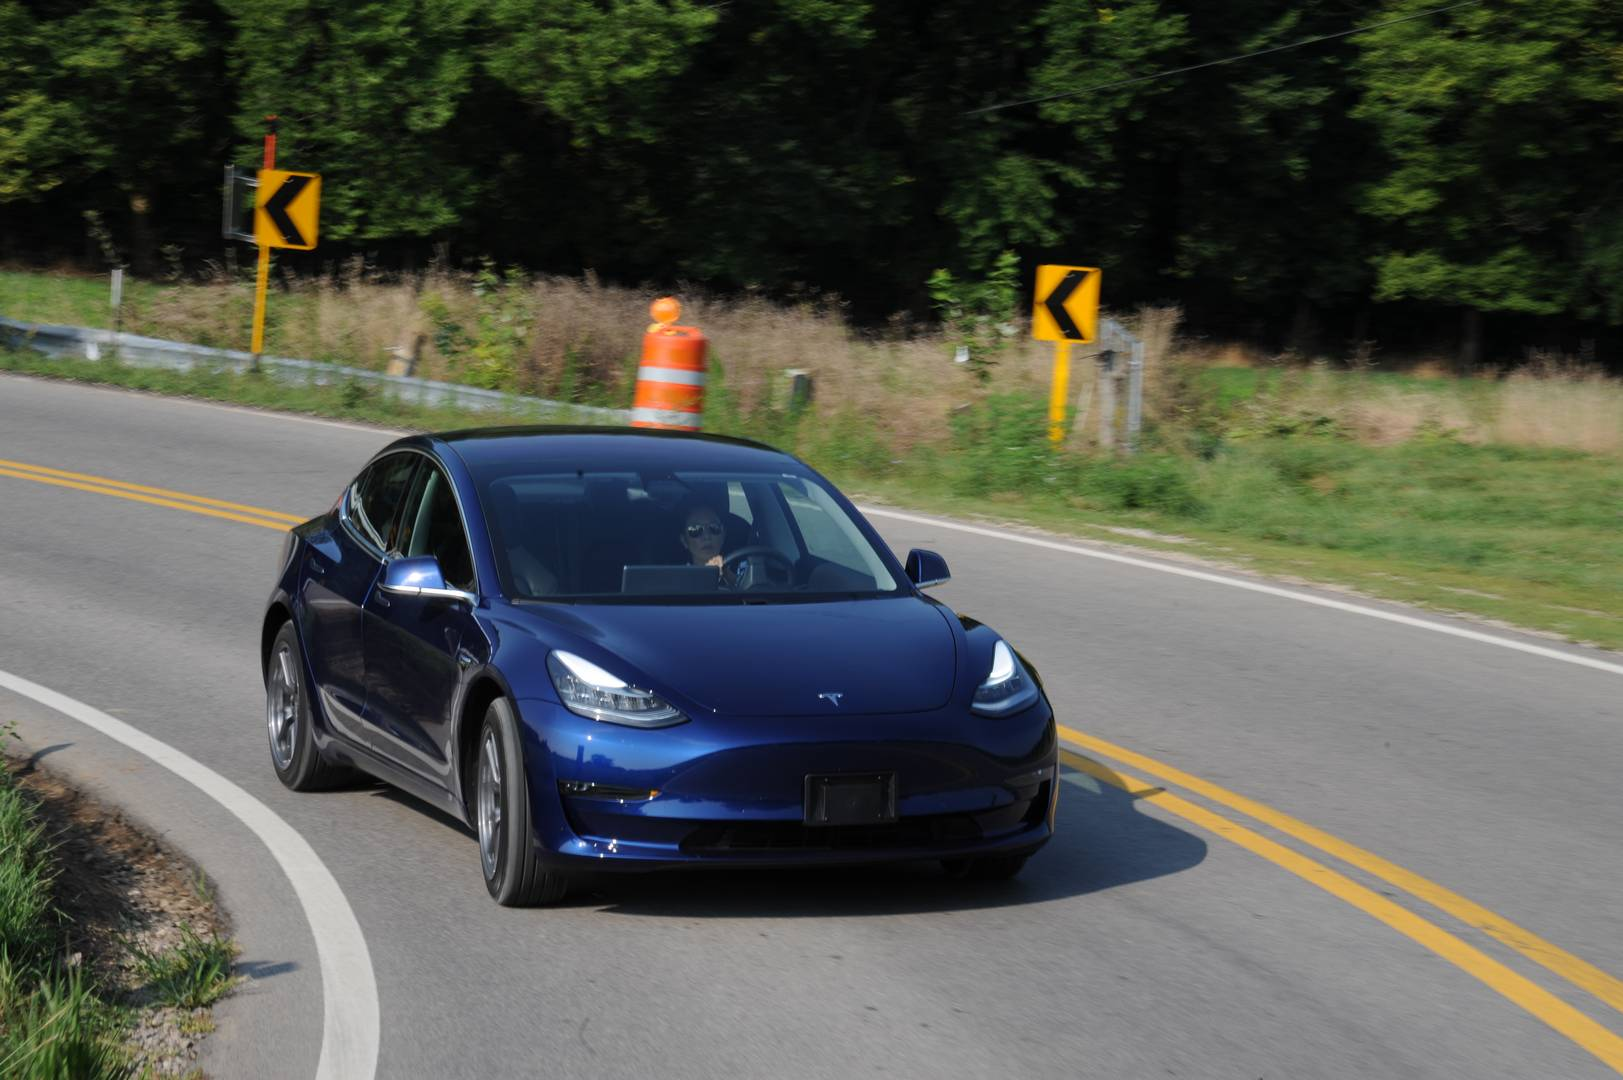 Tesla Model 3 Review: No Future